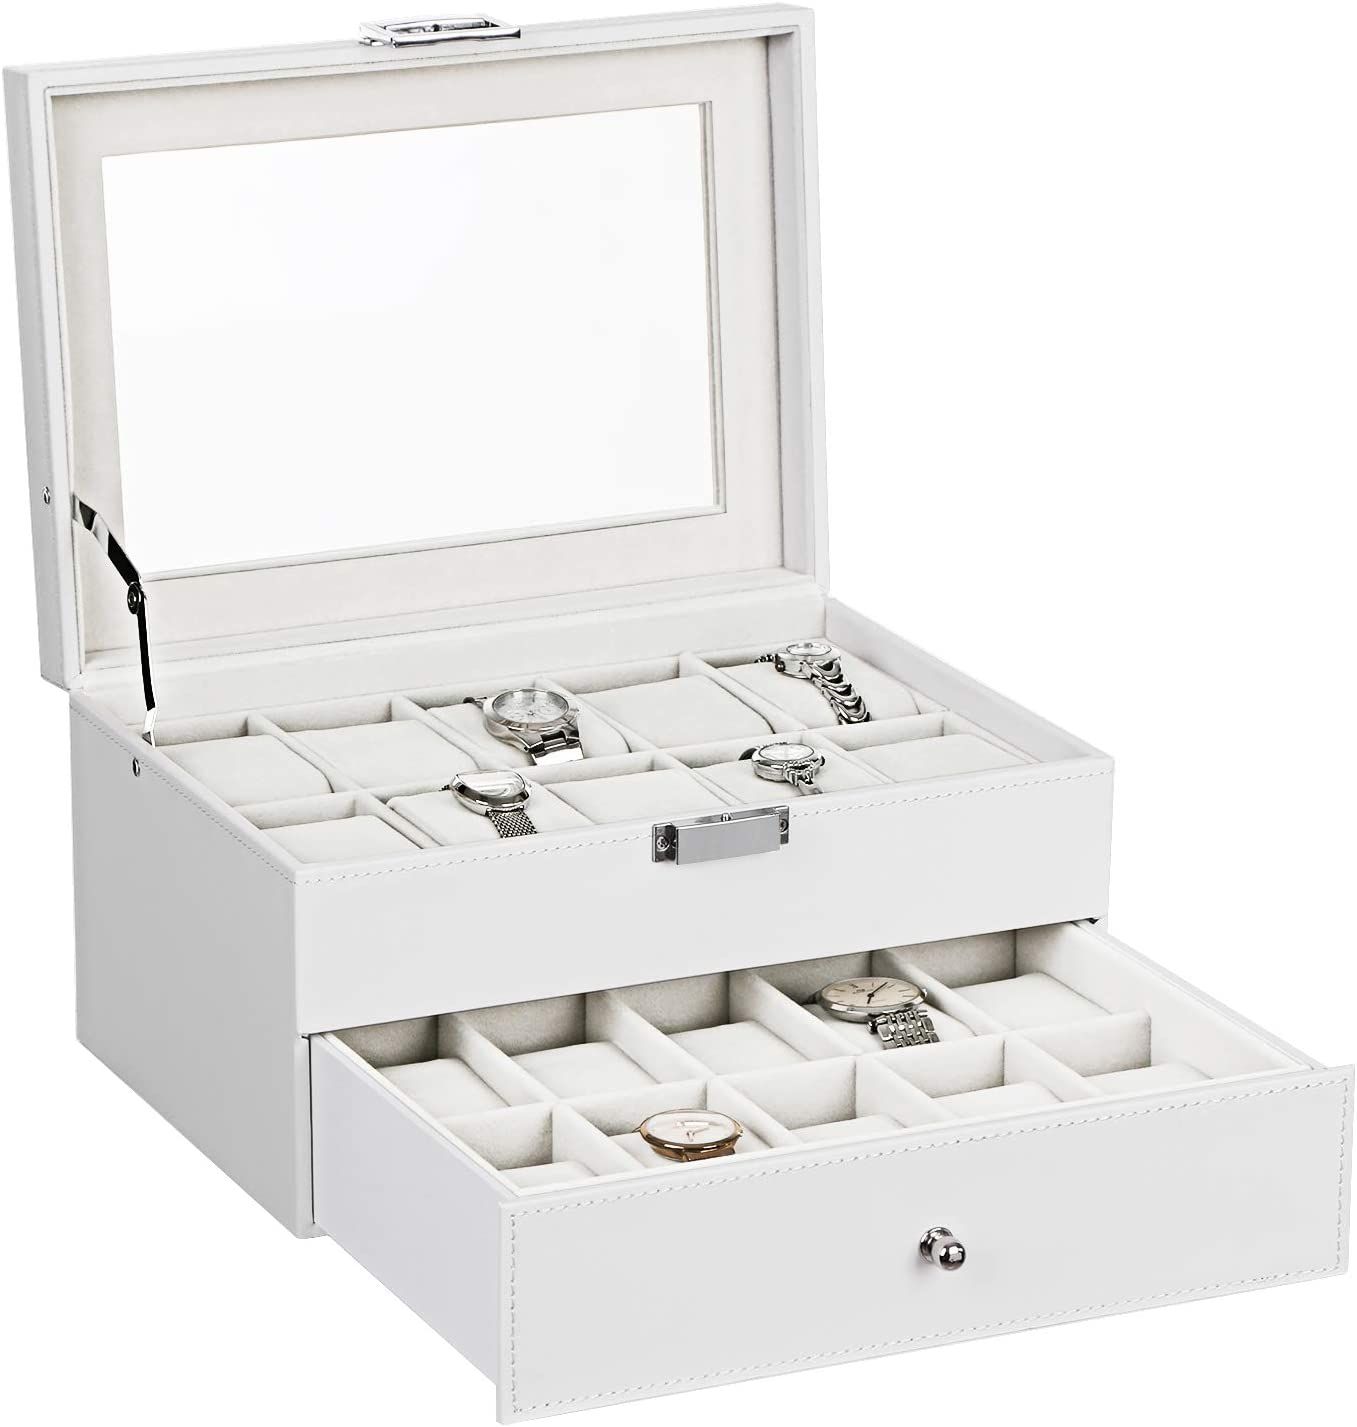 BEWISHOME Watch Box Organizer 20 Men Women Watch Case Display Storage Holder Metal Hinge White PU Leather Glass Top Large Holder, White SSH04W